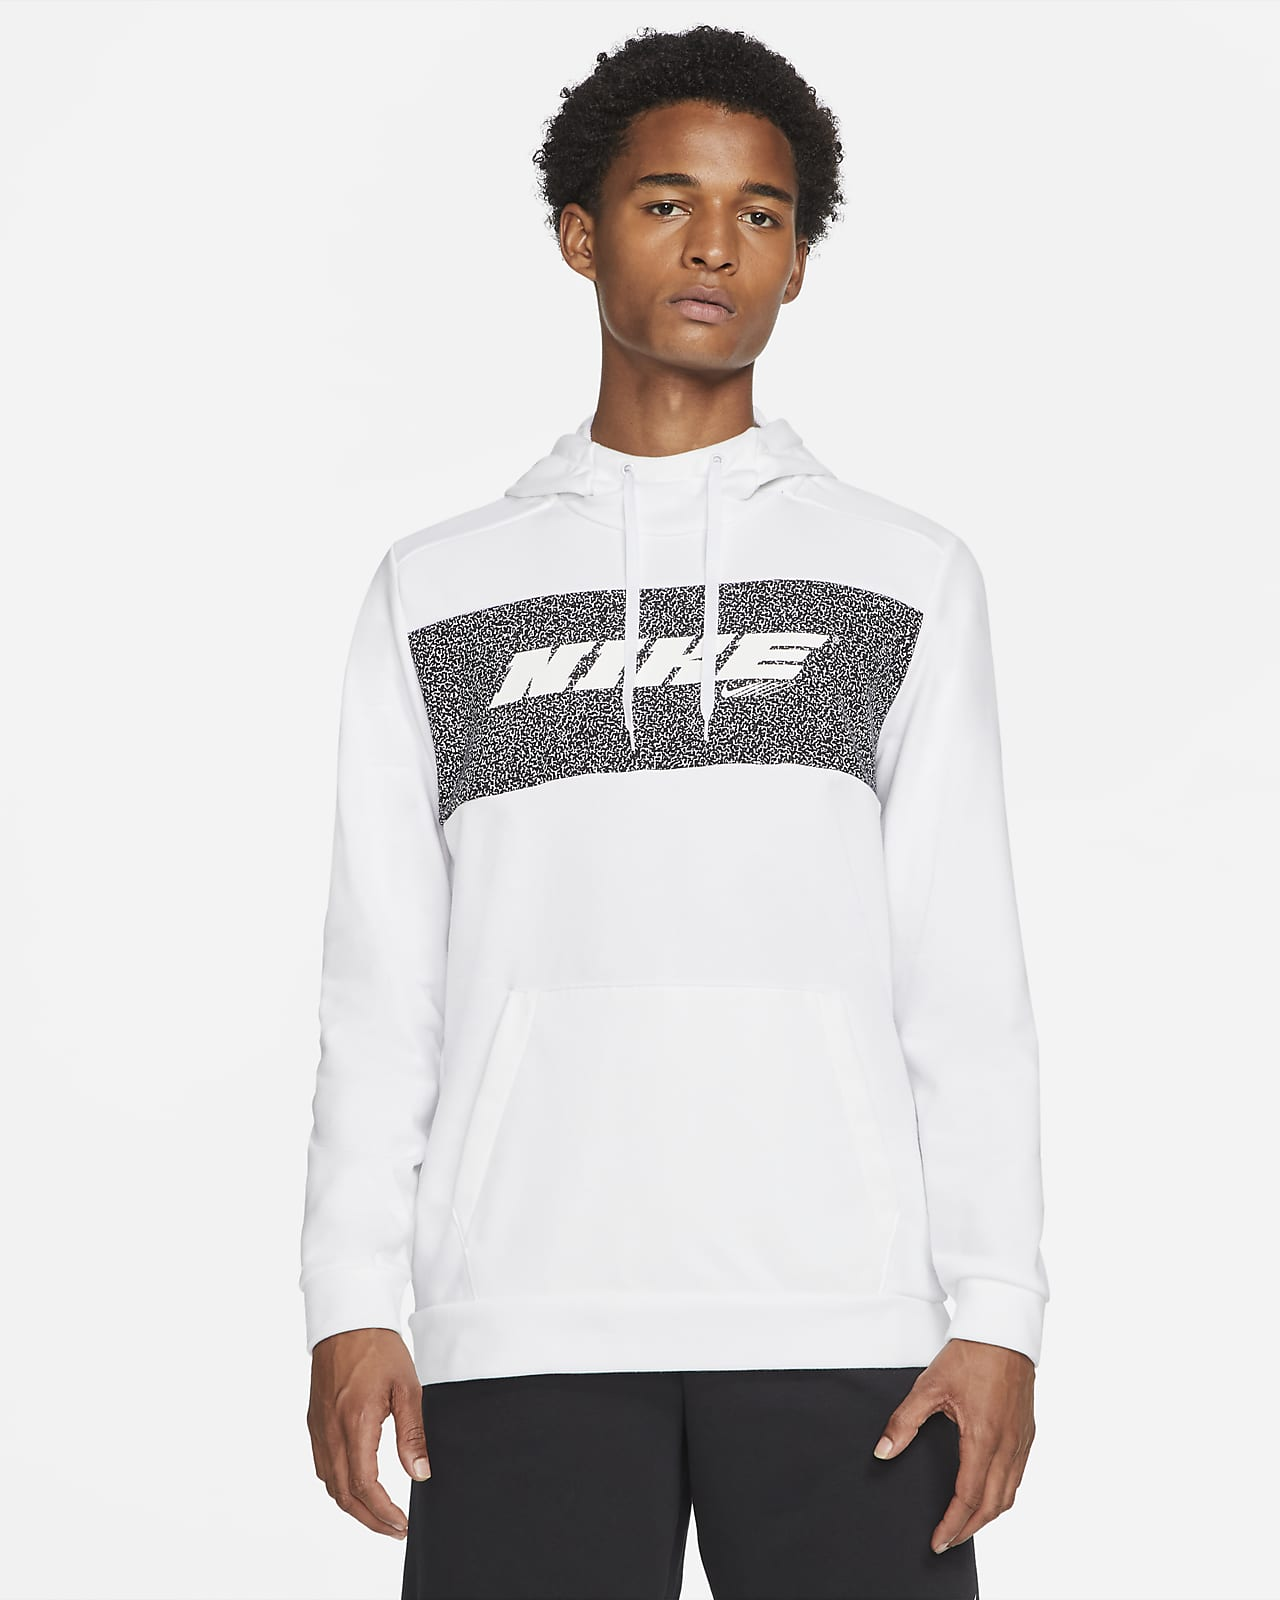 Hoodie pullover de treino Nike Dri-FIT Sport Clash para homem